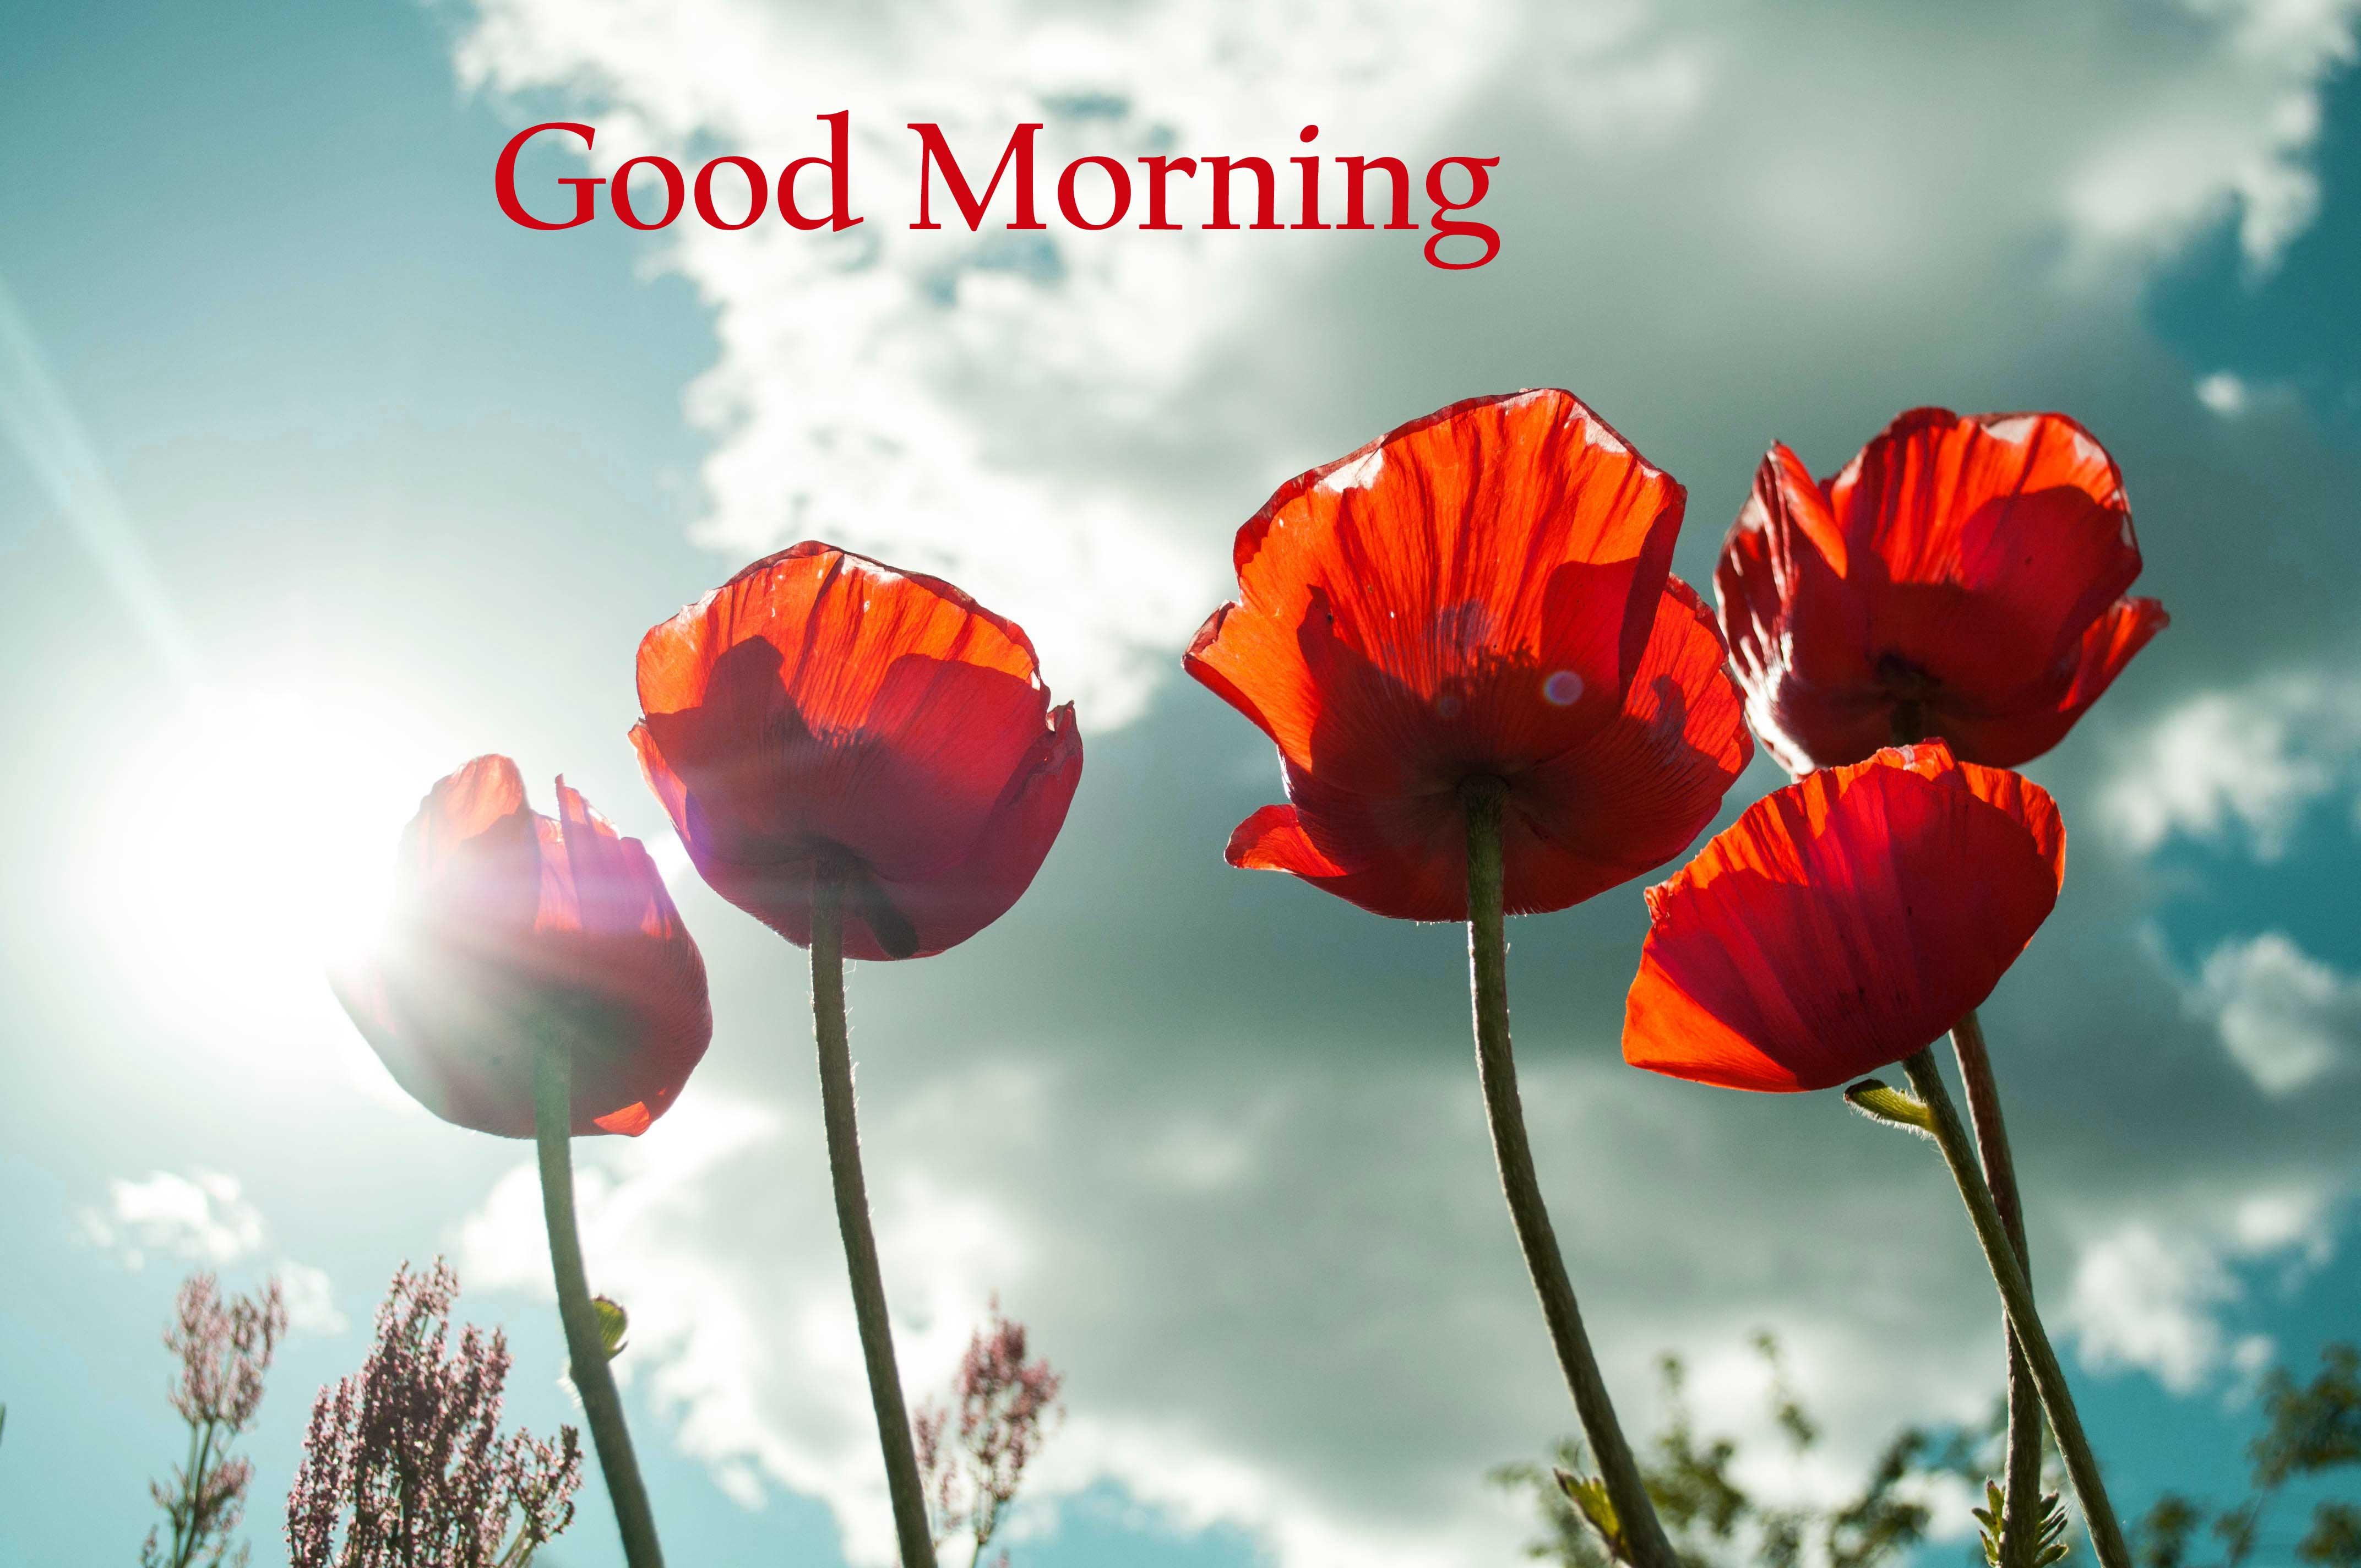 flowers good morning Pics